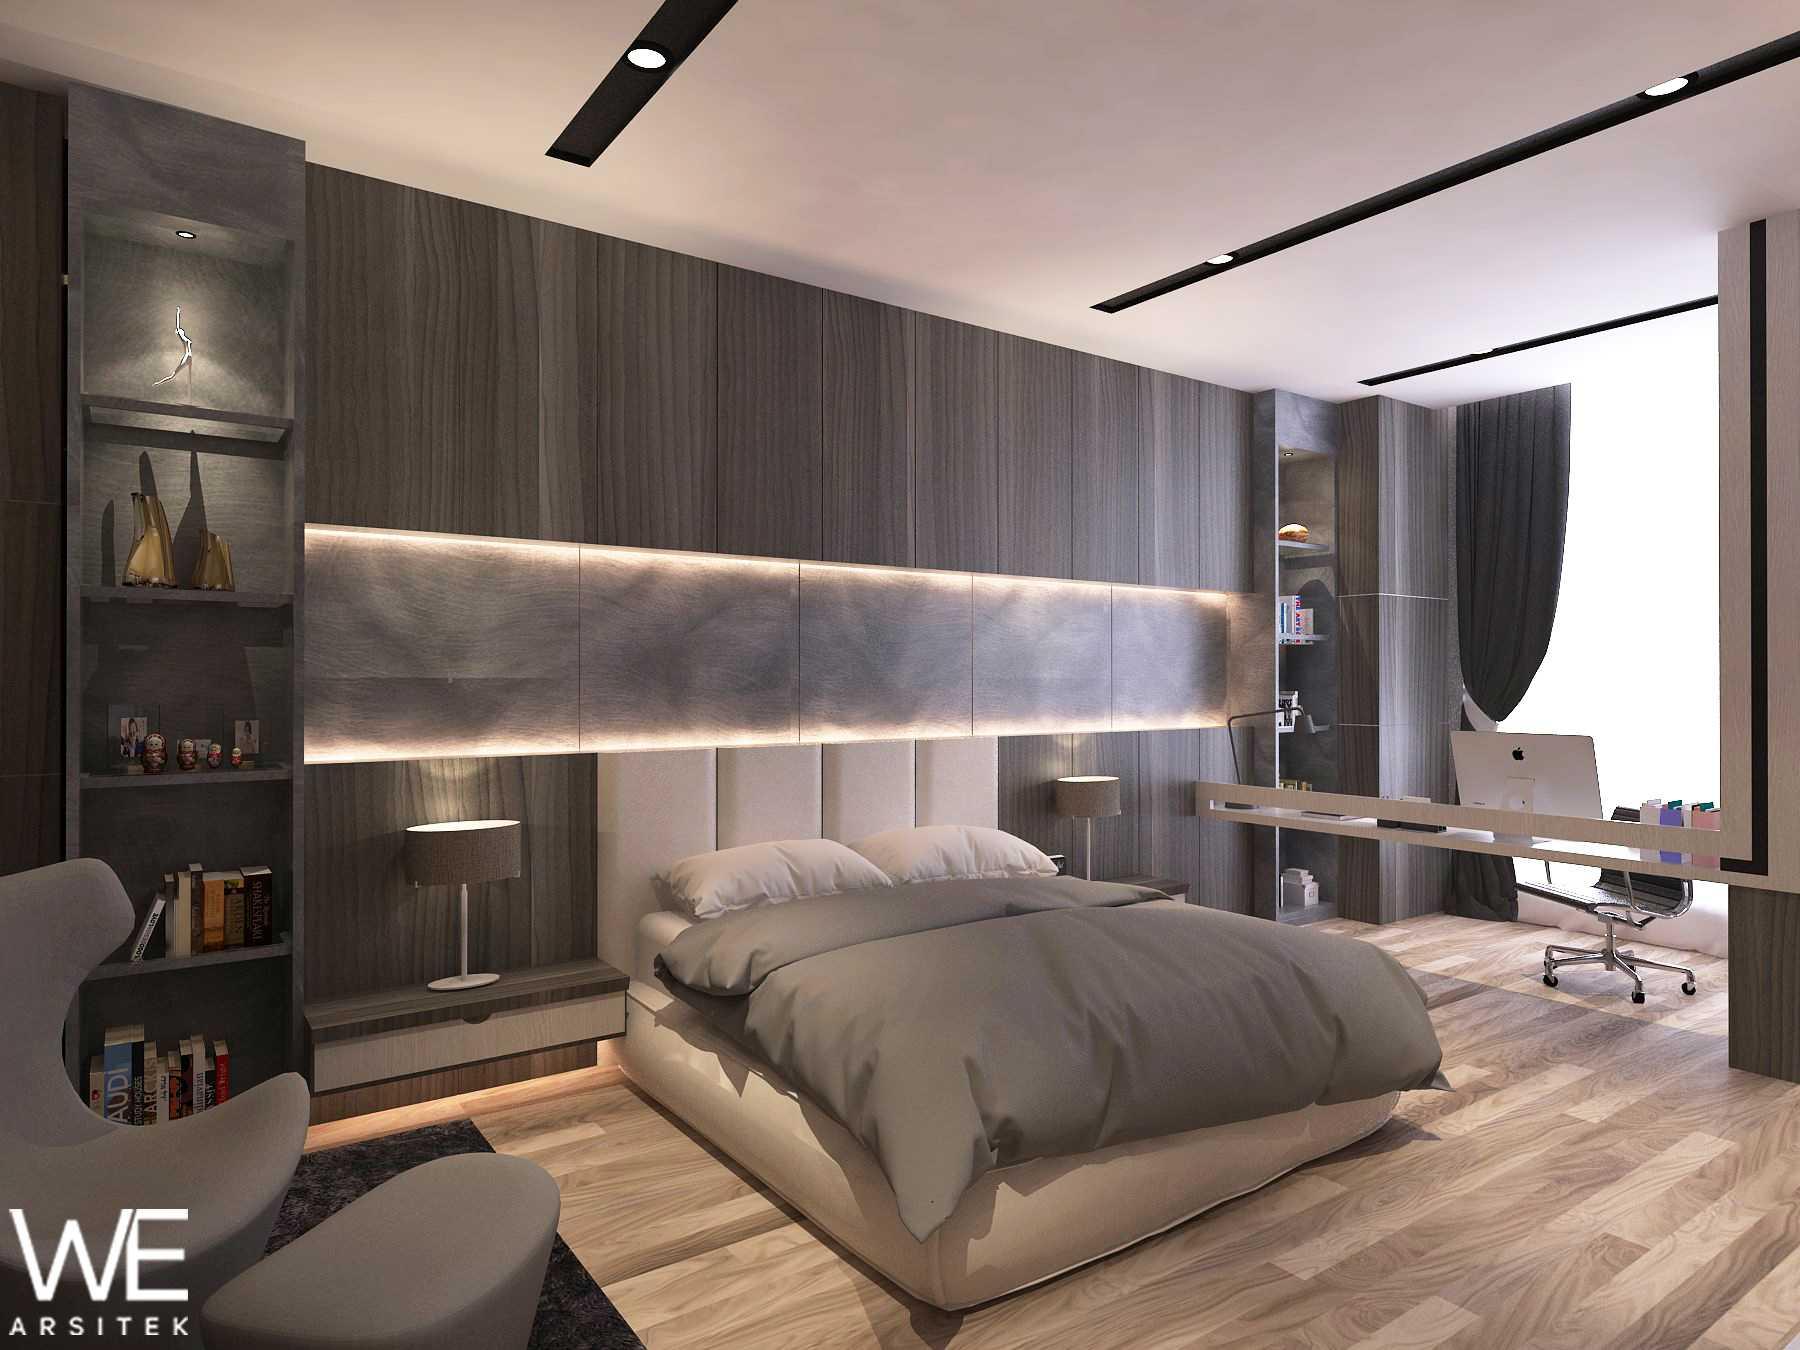 We Arsitek Li Residence - Contemporary Kota Medan, Sumatera Utara, Indonesia Kota Medan, Sumatera Utara, Indonesia Master Bedroom   45717